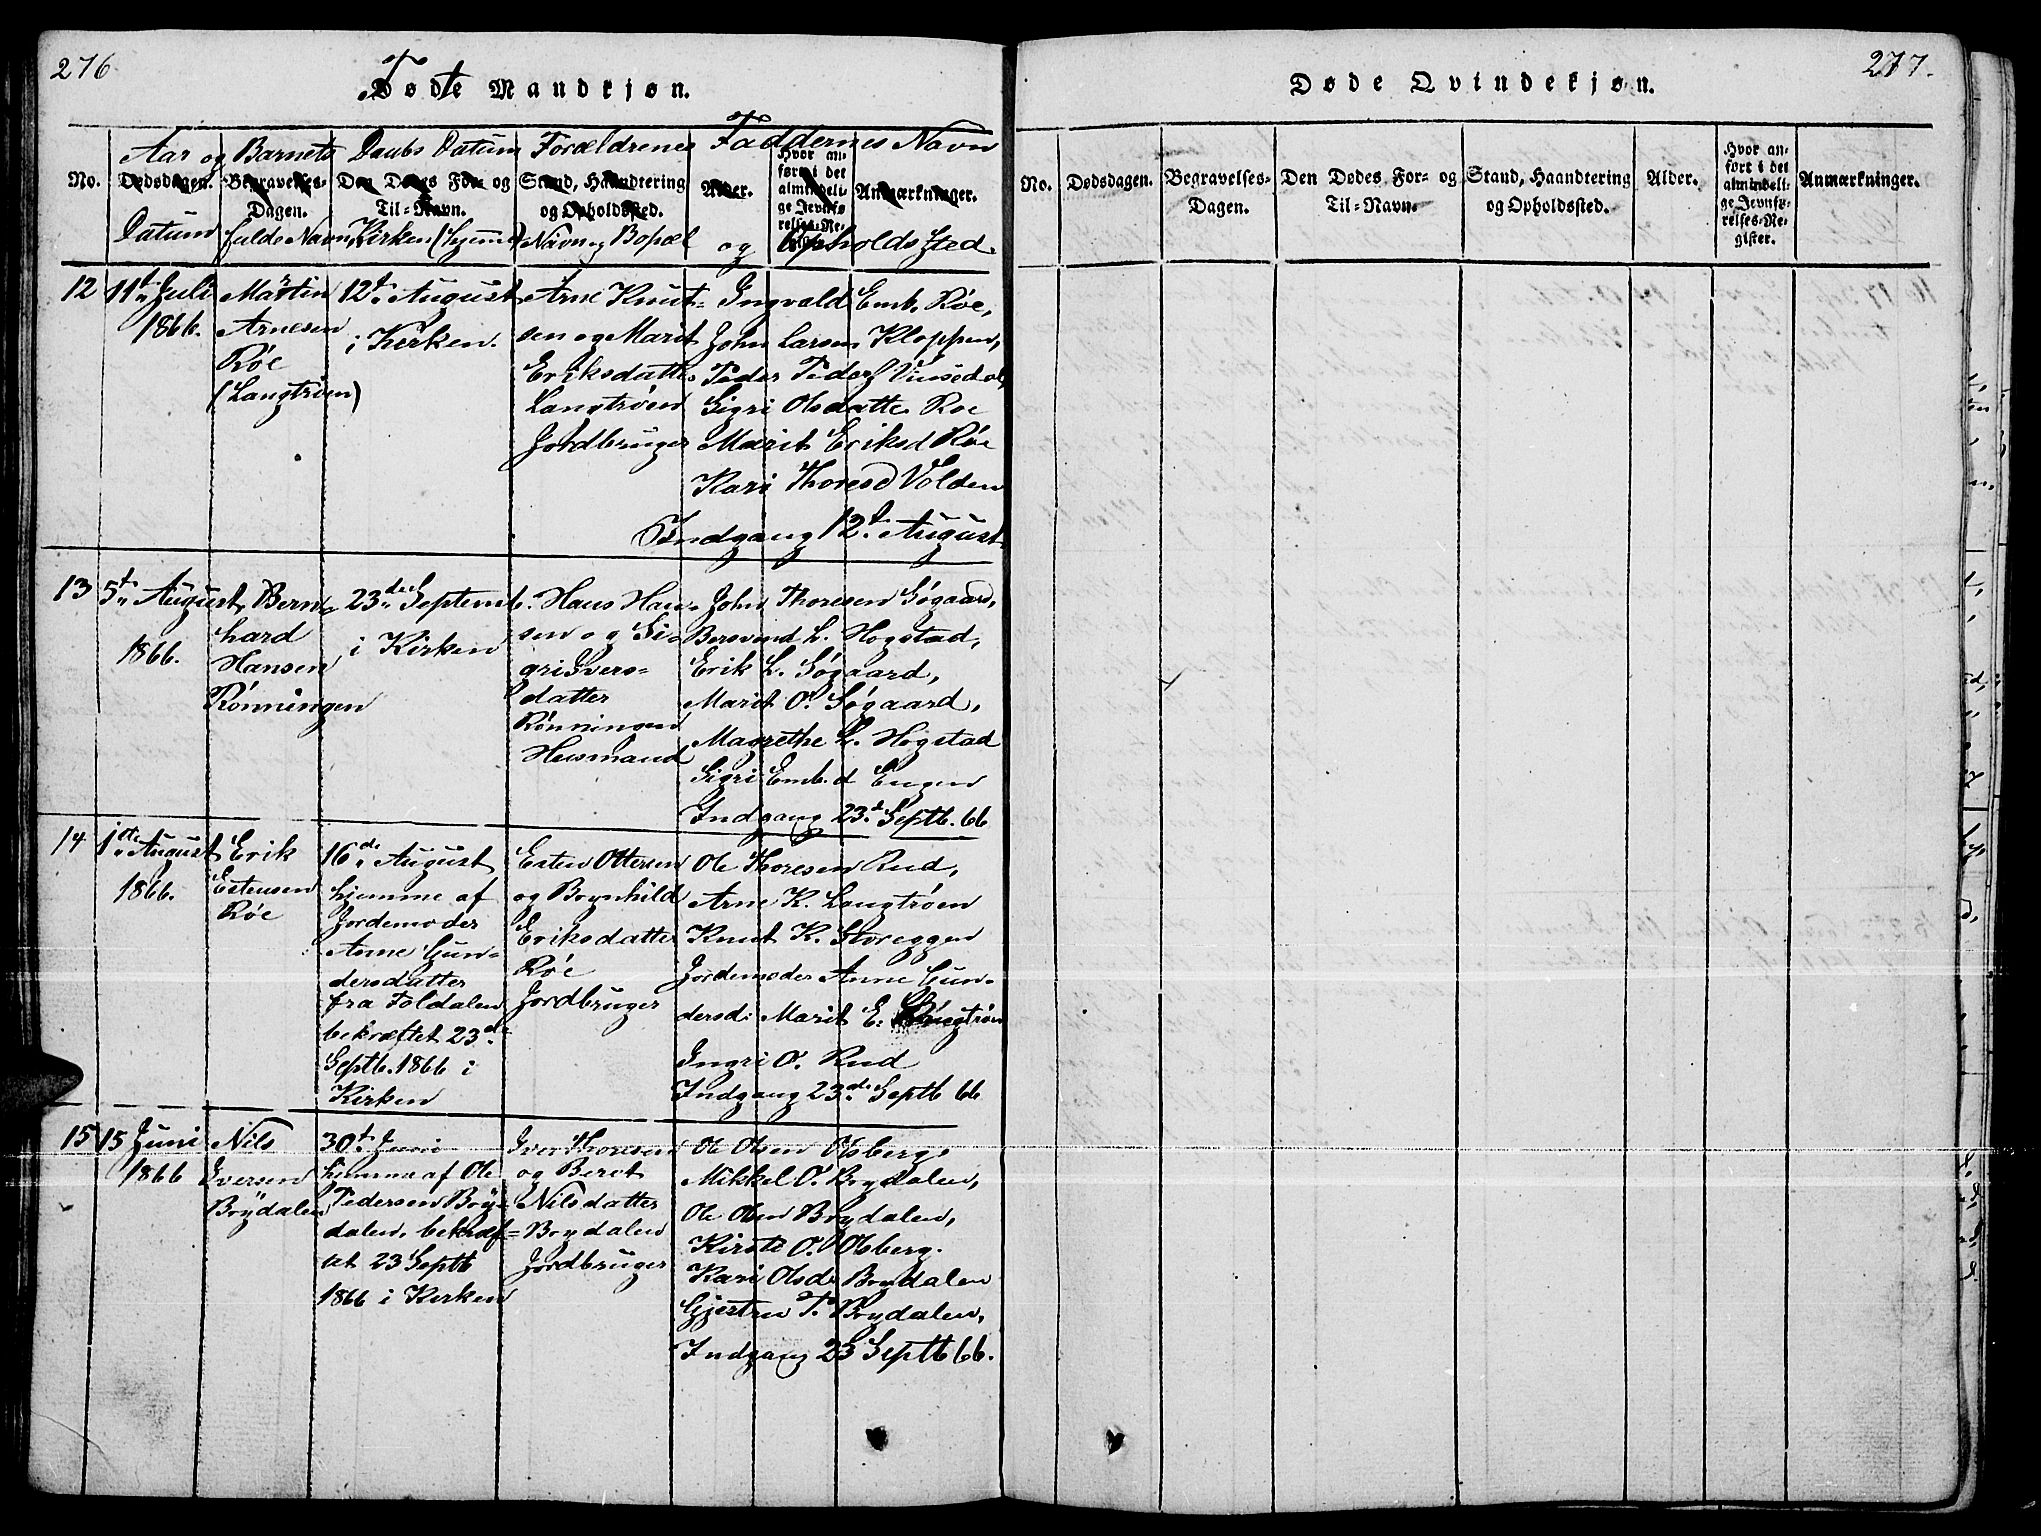 SAH, Tynset prestekontor, Parish register (copy) no. 4, 1814-1879, p. 276-277